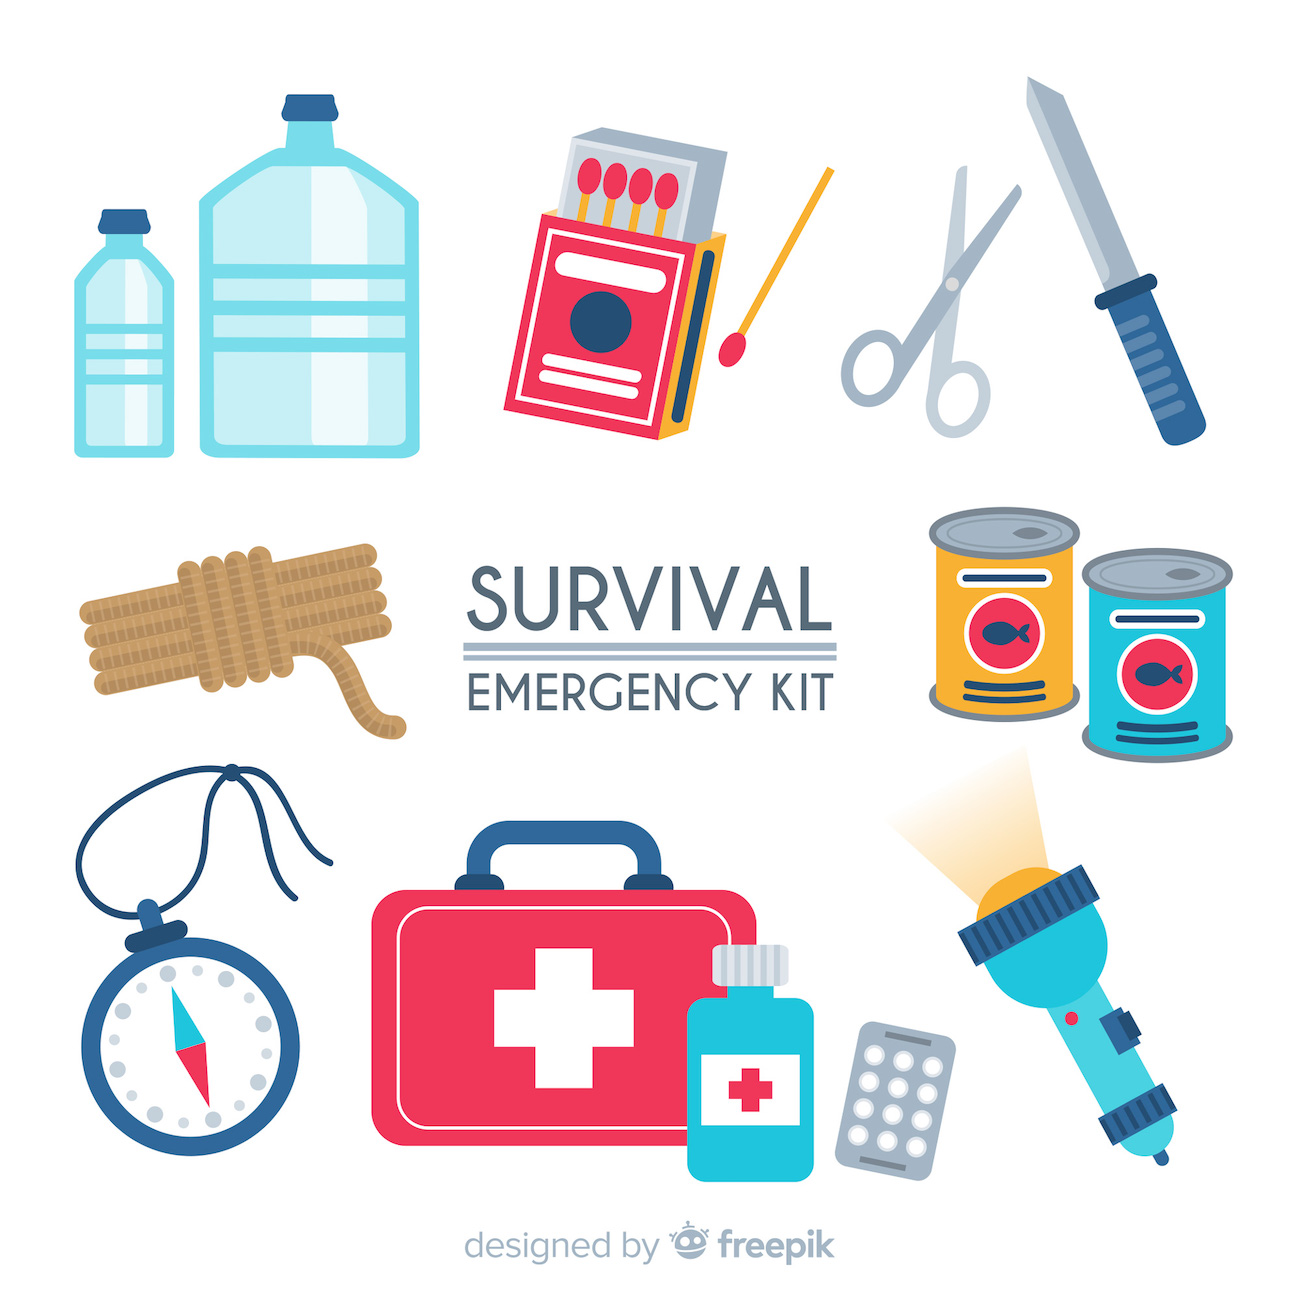 ux-survival-kit-cover-image.jpg